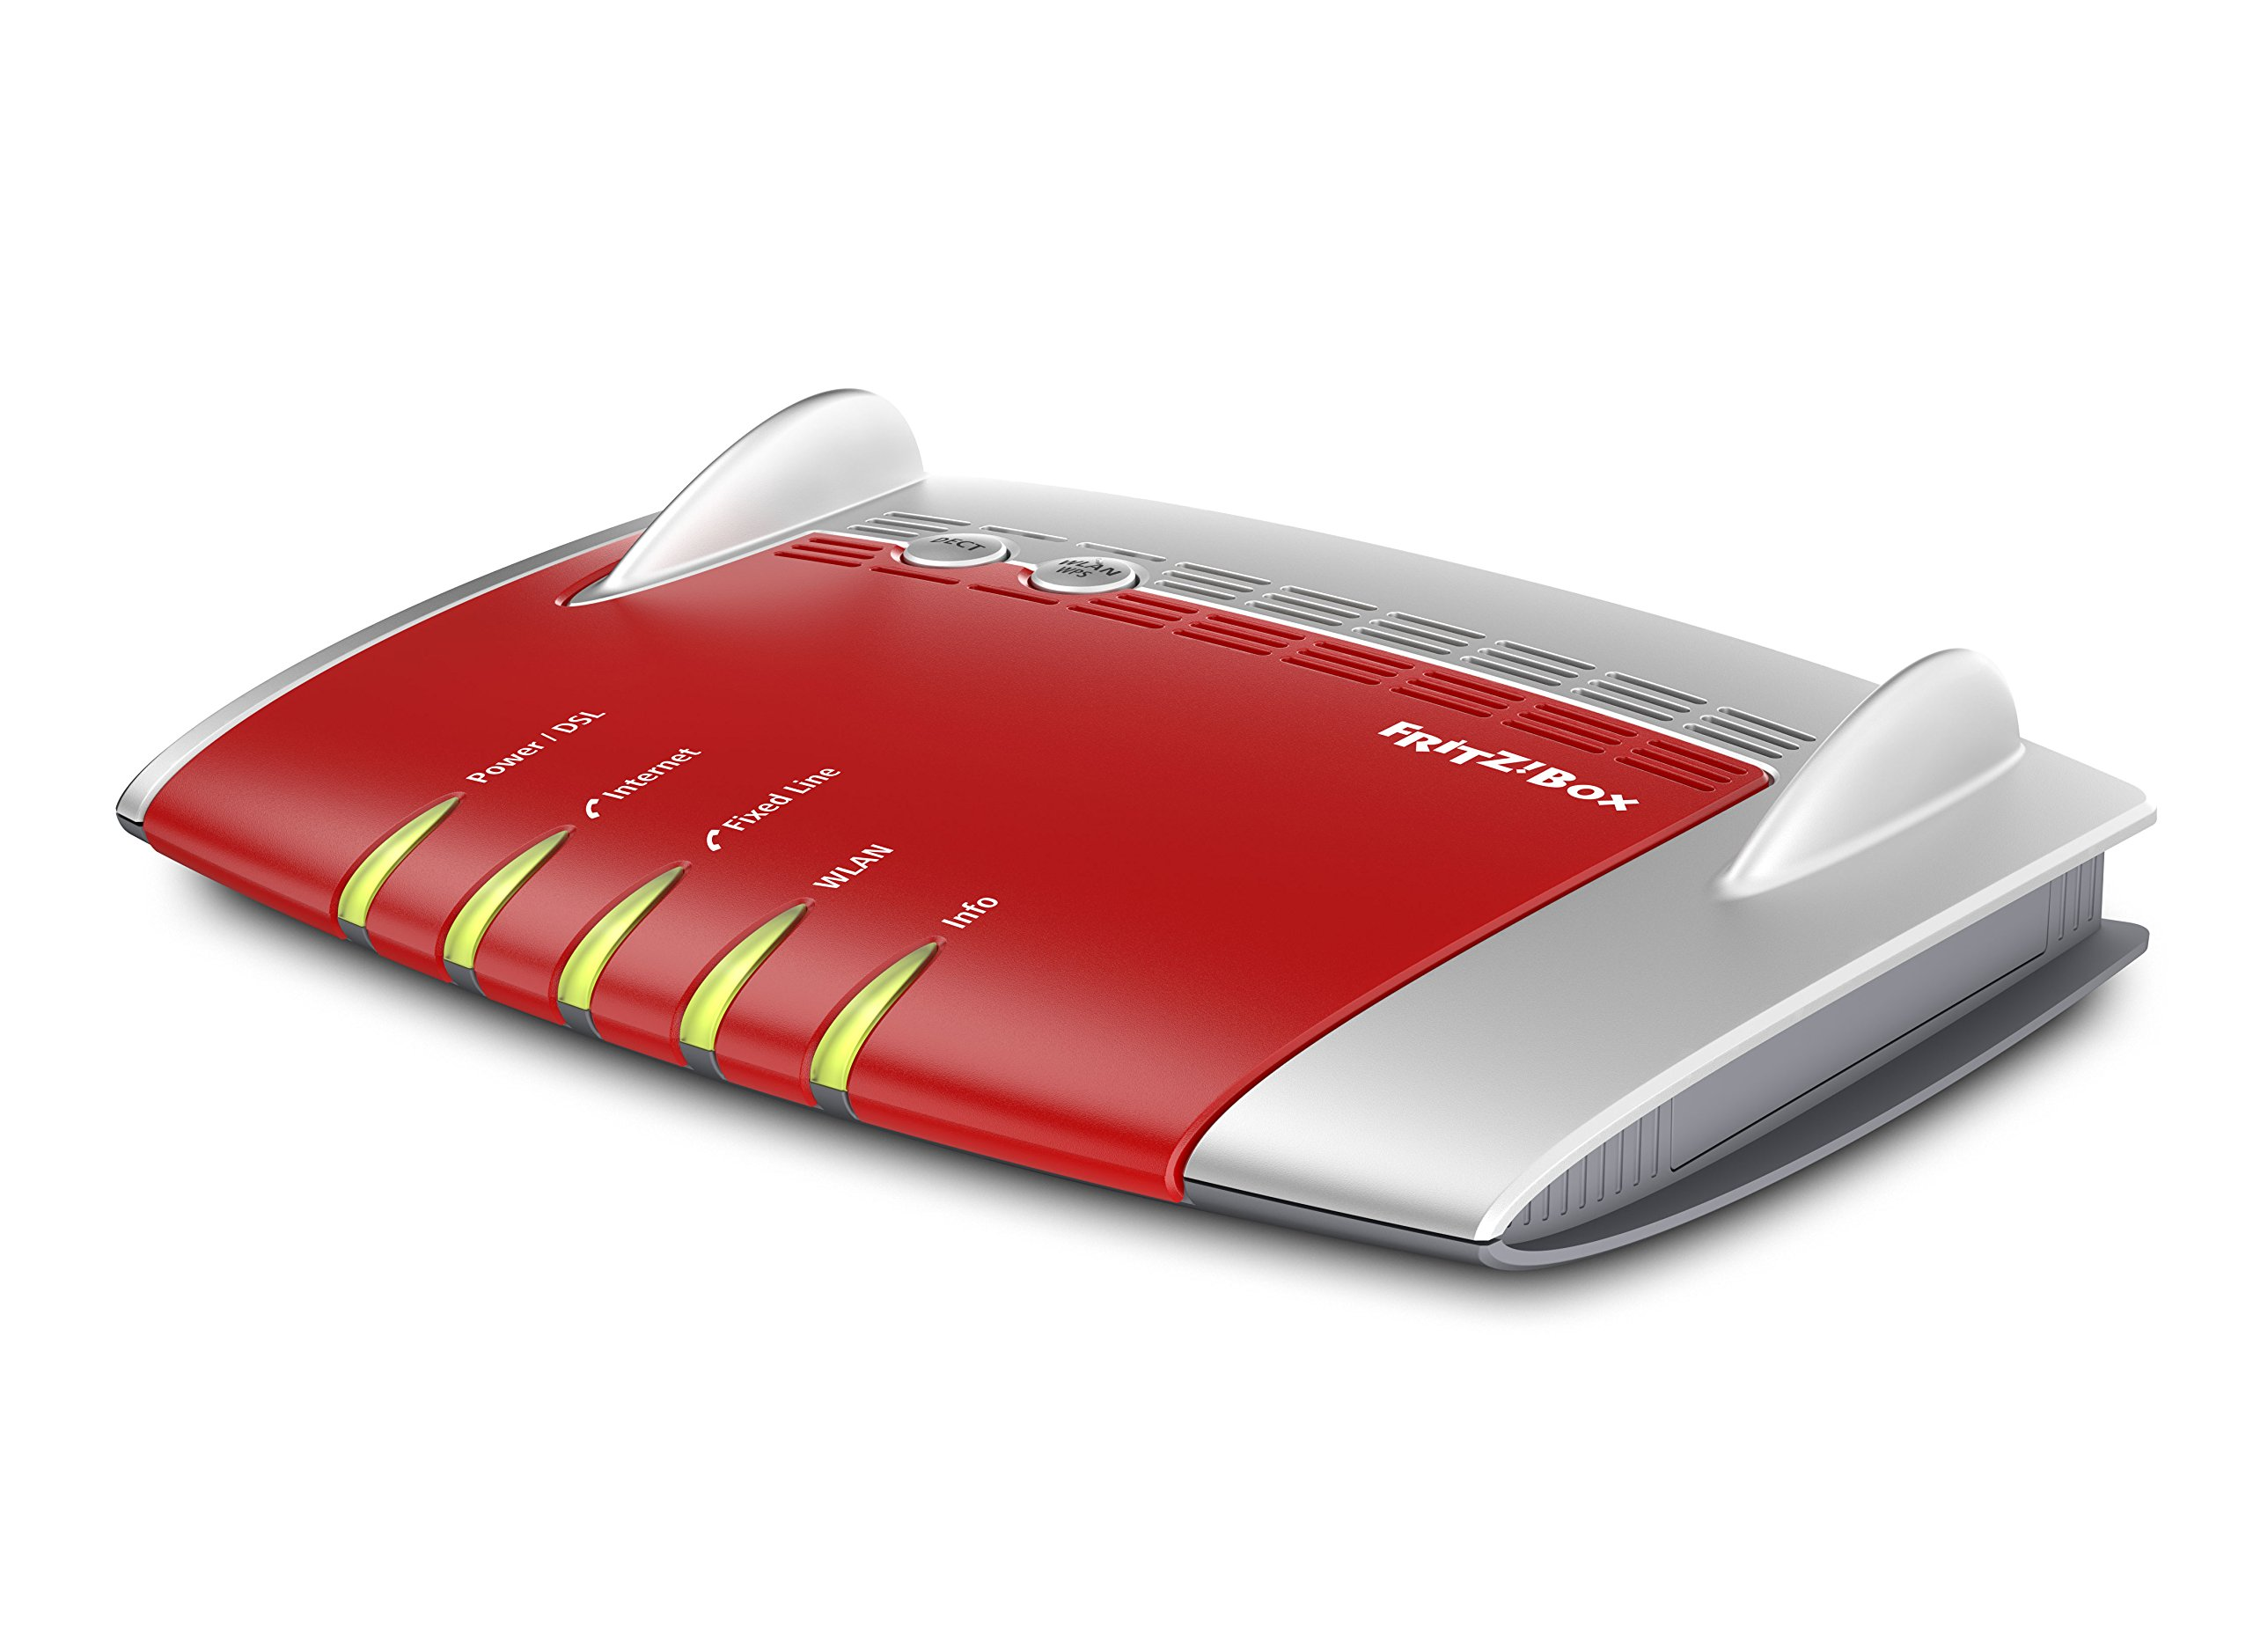 AVM FRITZ!Box 7490 International 4-Port Gigabit Wi-Fi 11AC Router with Integrated FTTC/ADSL Modem